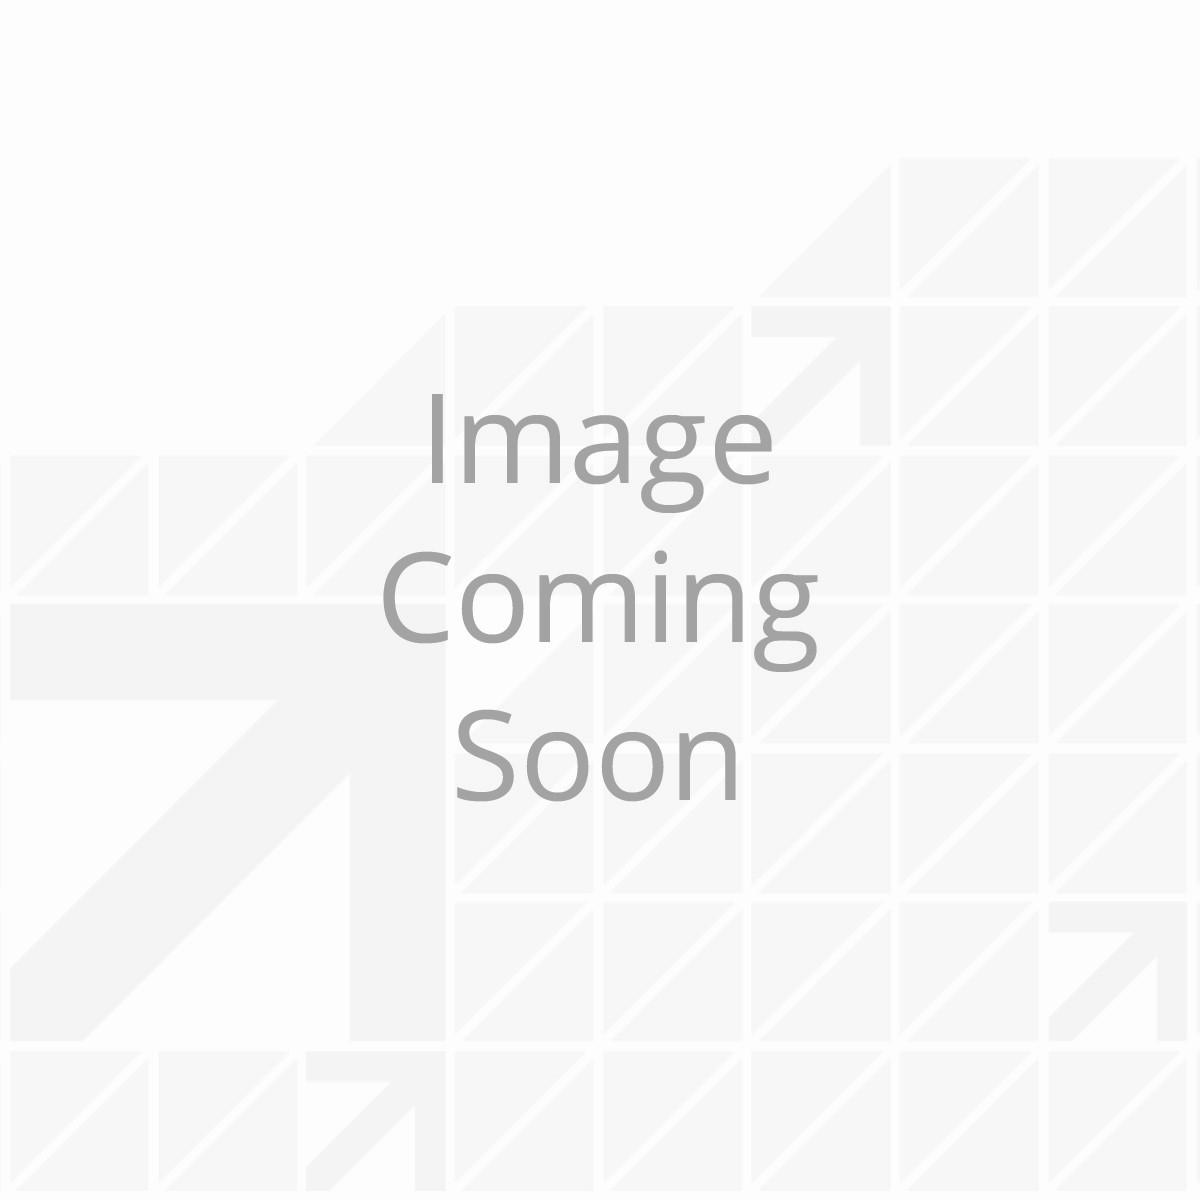 14' Power & Hybrid Awning Roller Assembly - Prepflex Green Fade